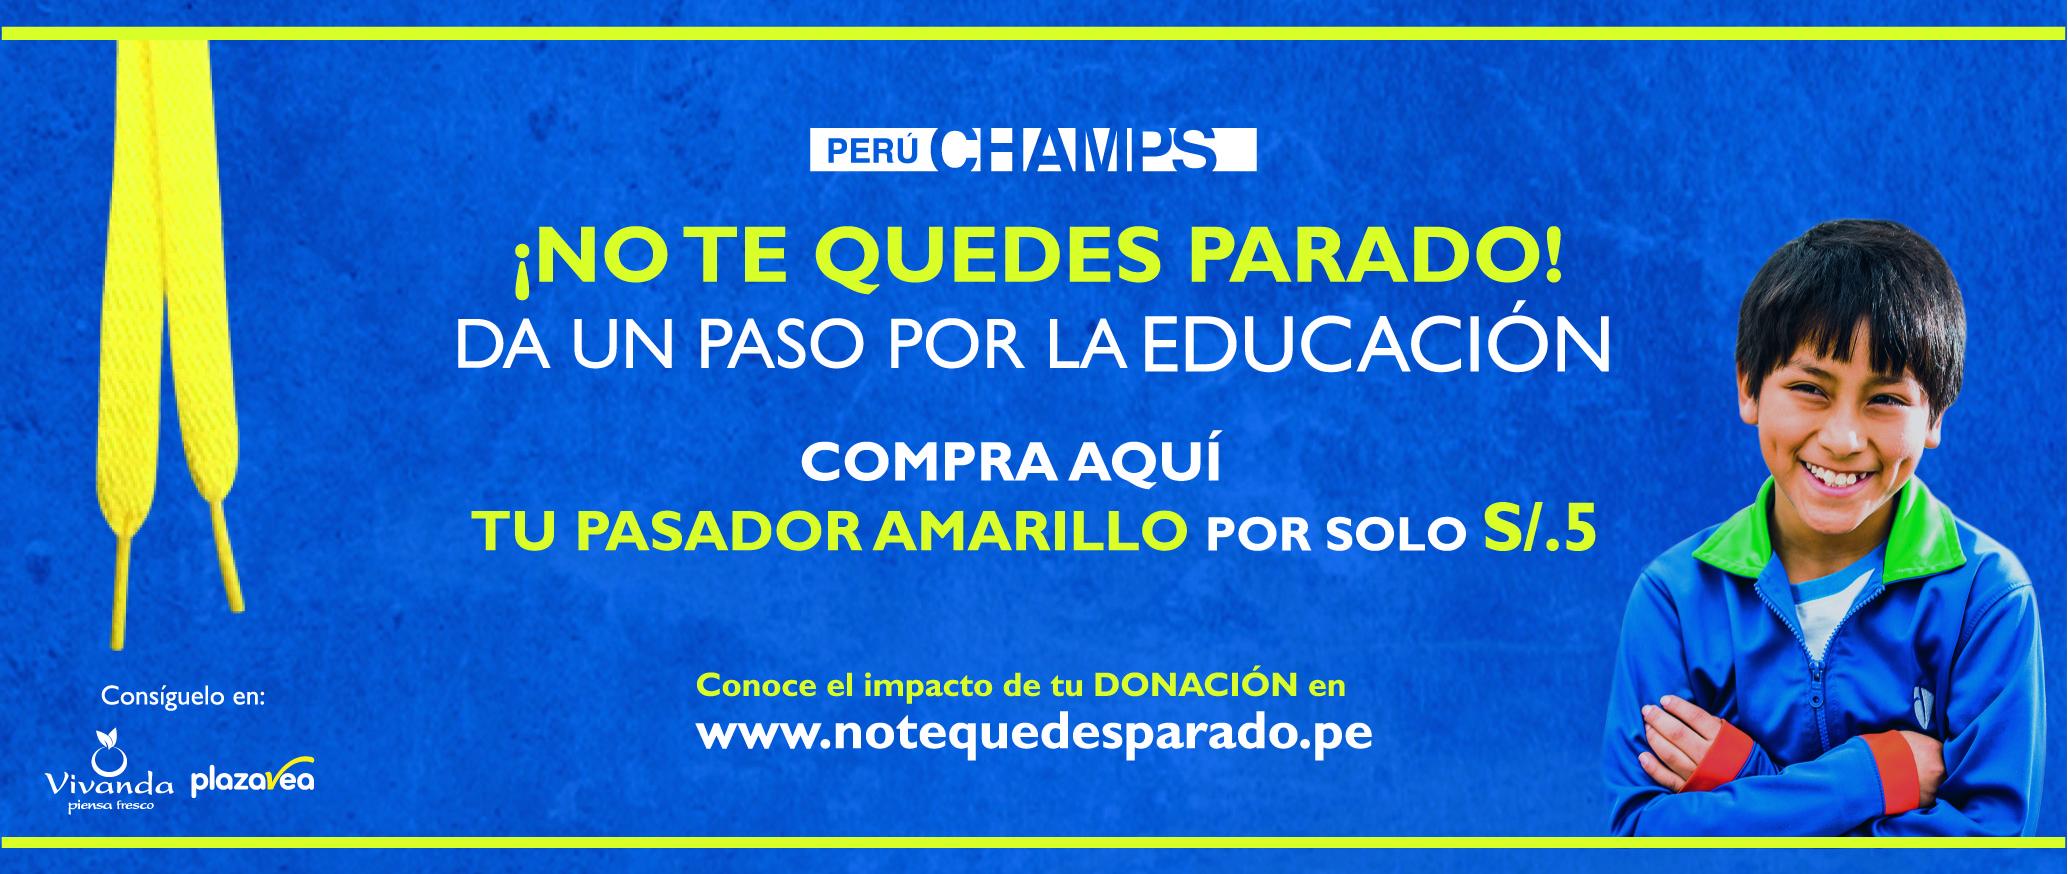 Peru Champs - Campaña Un Paso por Educacion-01